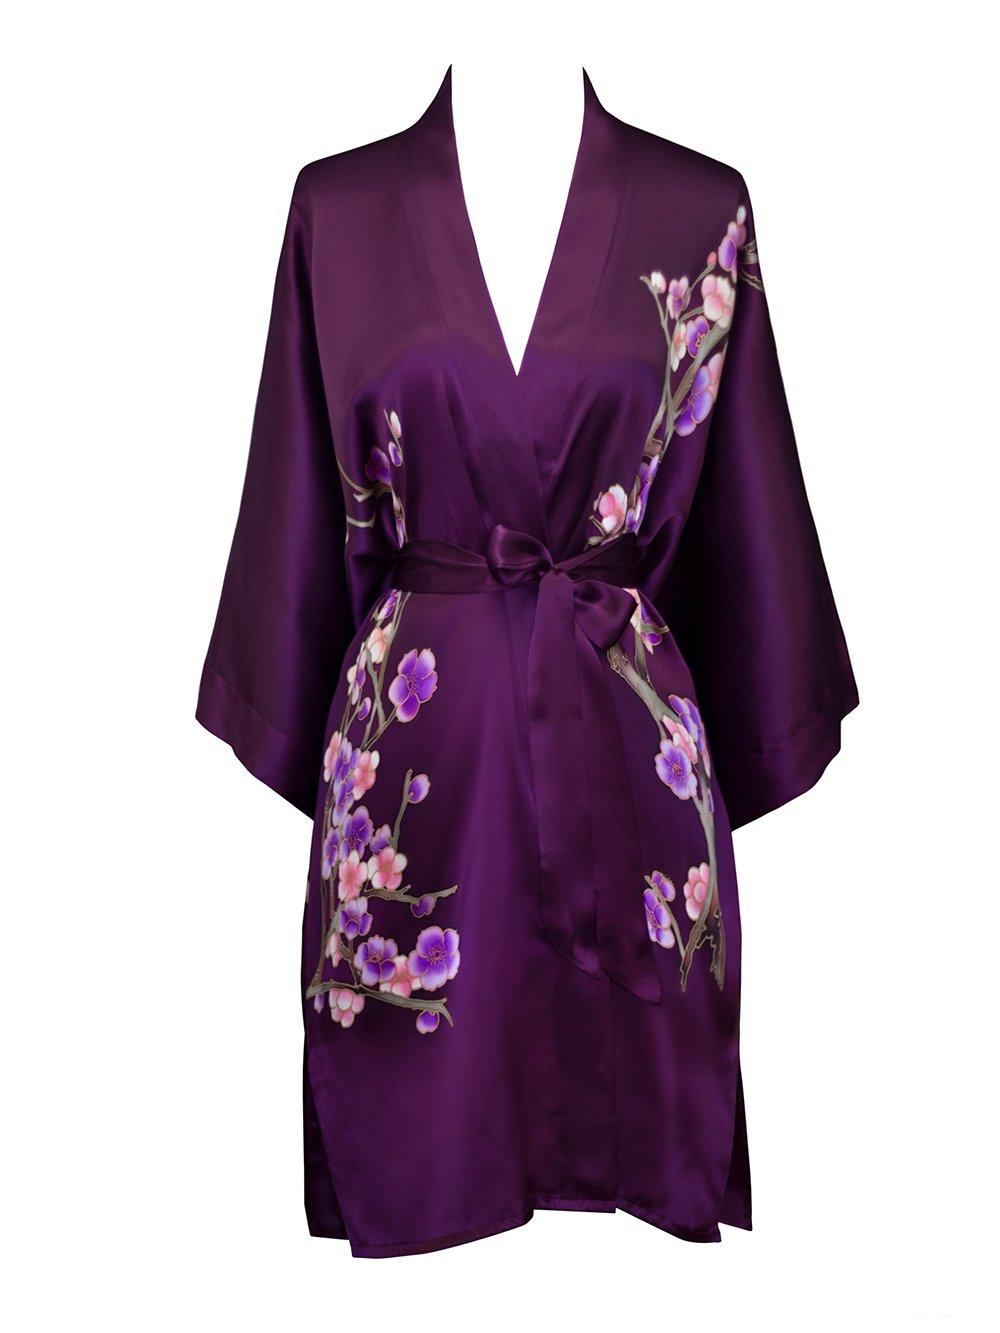 Old Shanghai Women's Silk Kimono Short Robe - Handpainted (Cherry Blossom Plum) by Old Shanghai (Image #3)